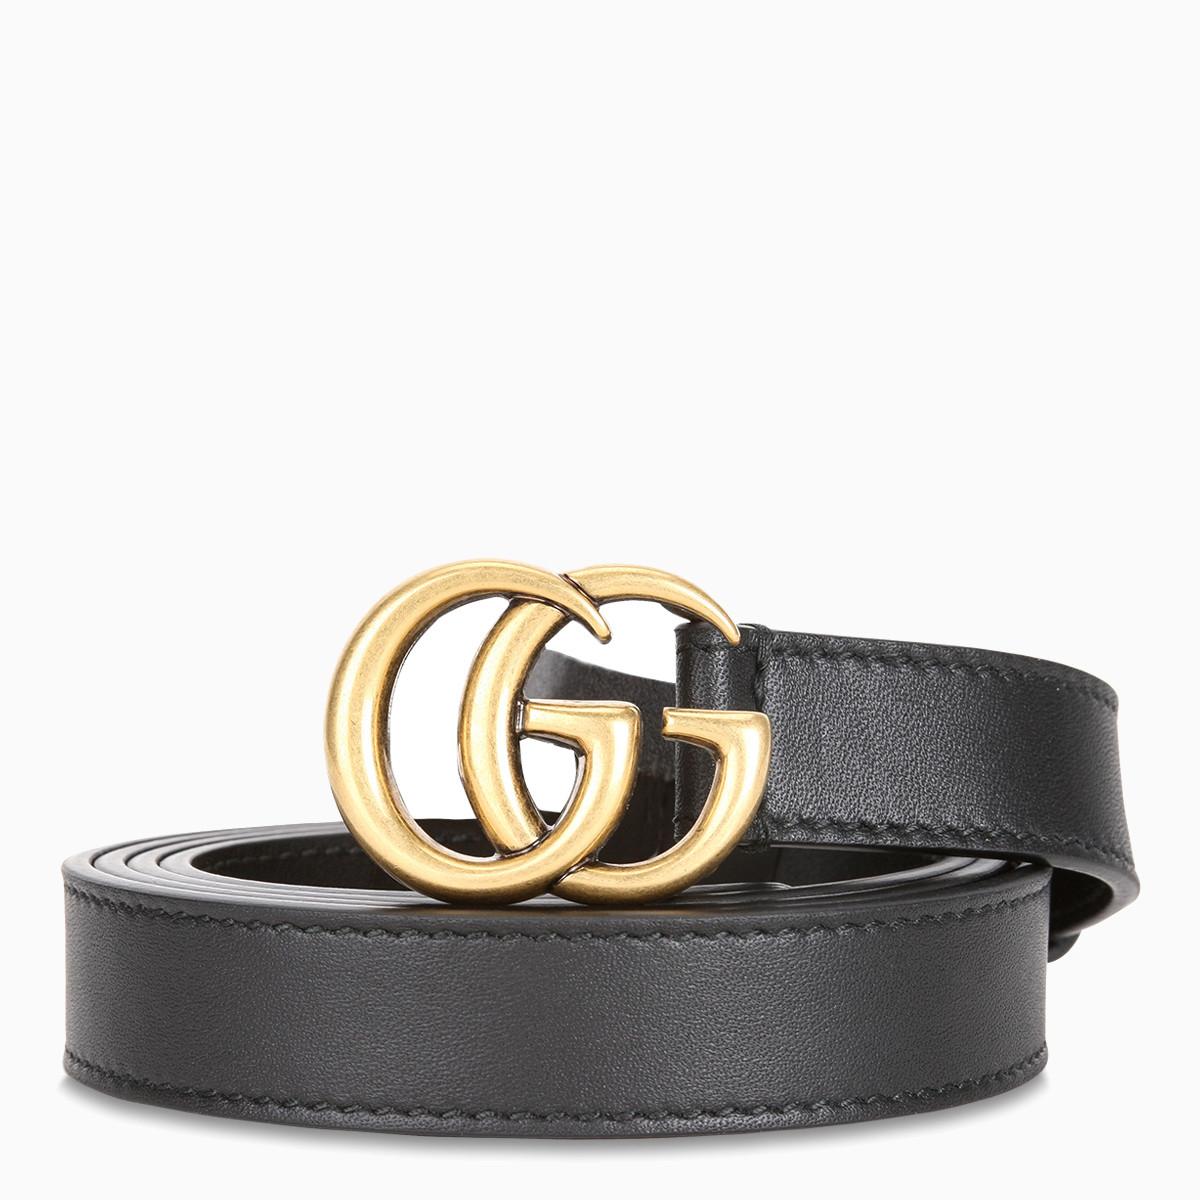 Come Riconoscere Una Cintura Gucci Falsa Phantomag